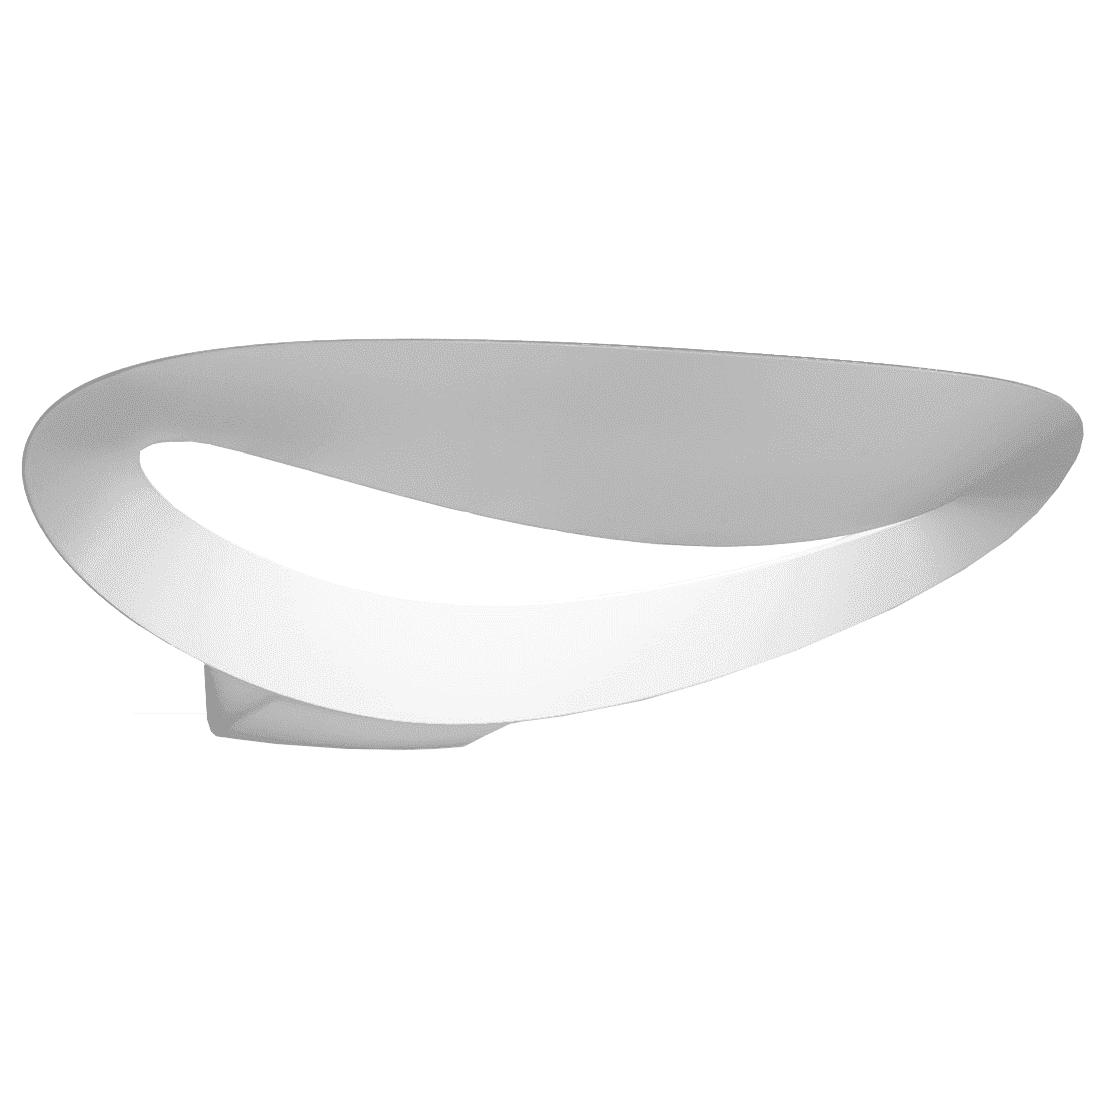 Artemide Mesmeri Wandlamp - Wit 2700 Kelvin